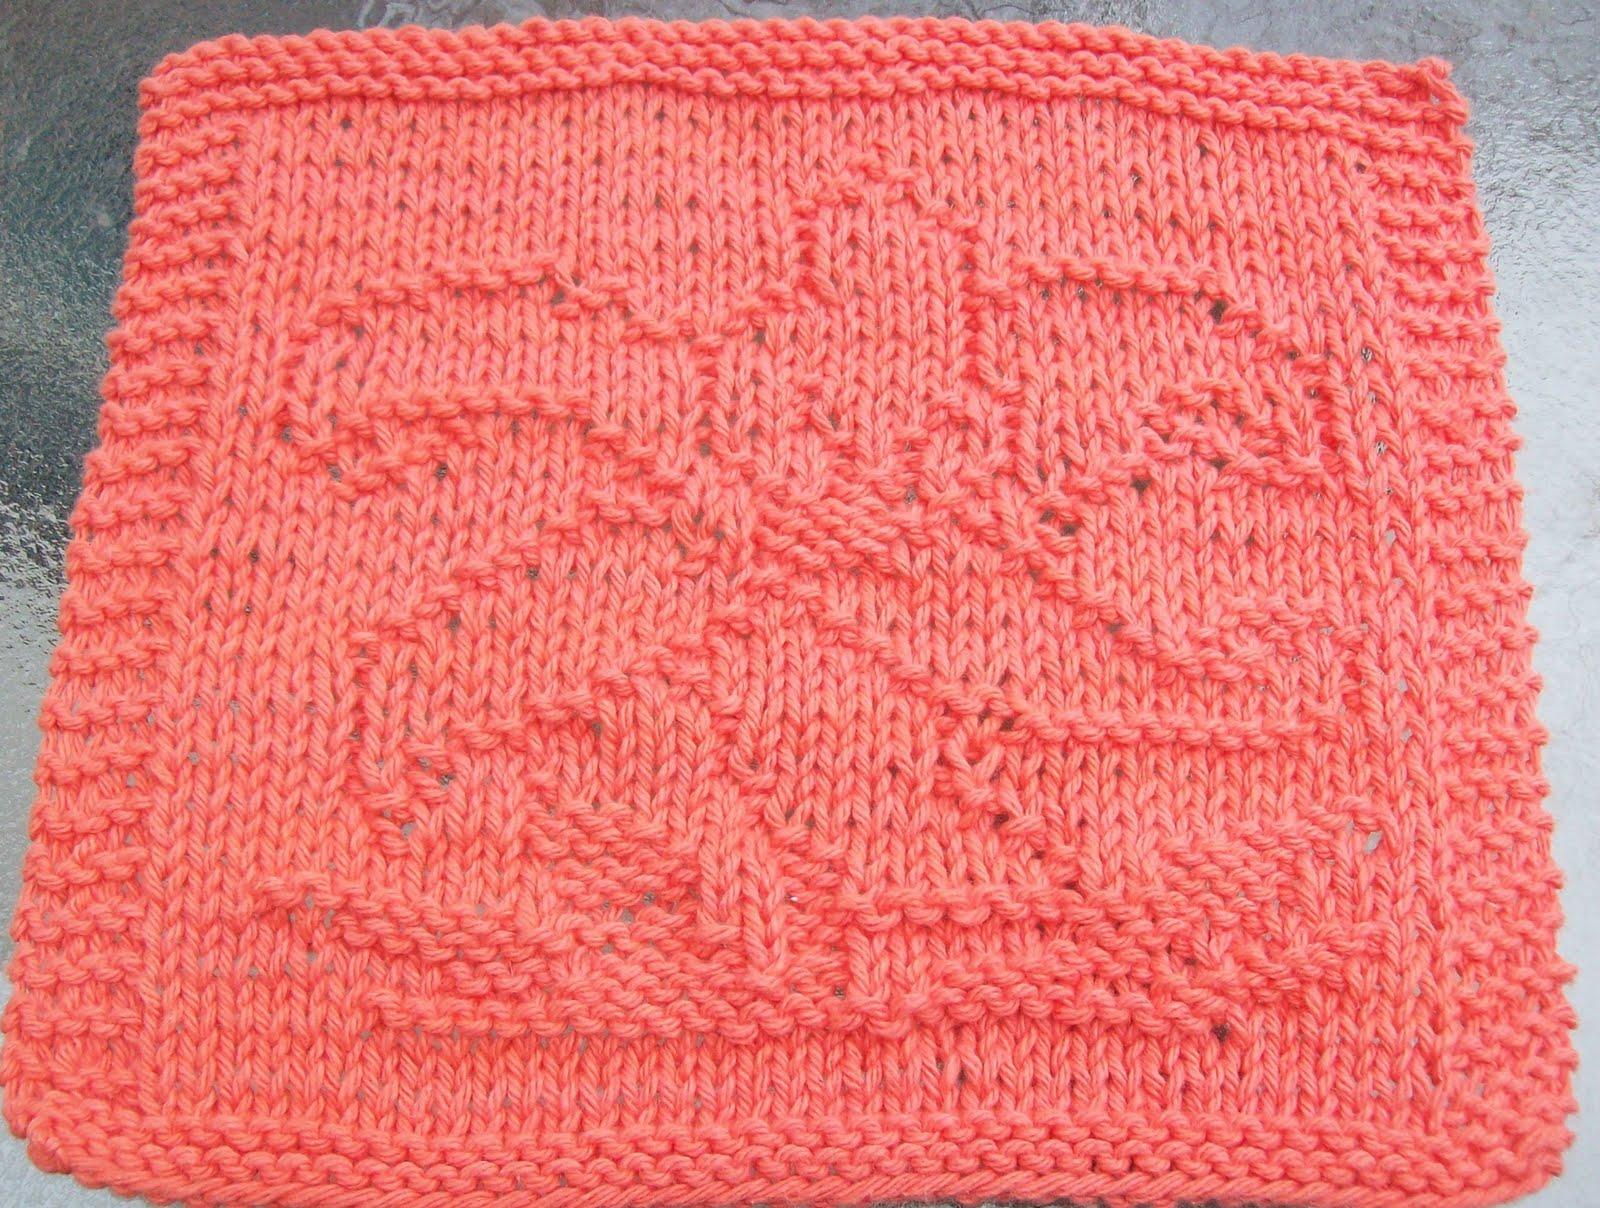 Knitting Dishcloth Pattern Free : Knitted dishcloth patterns bing images